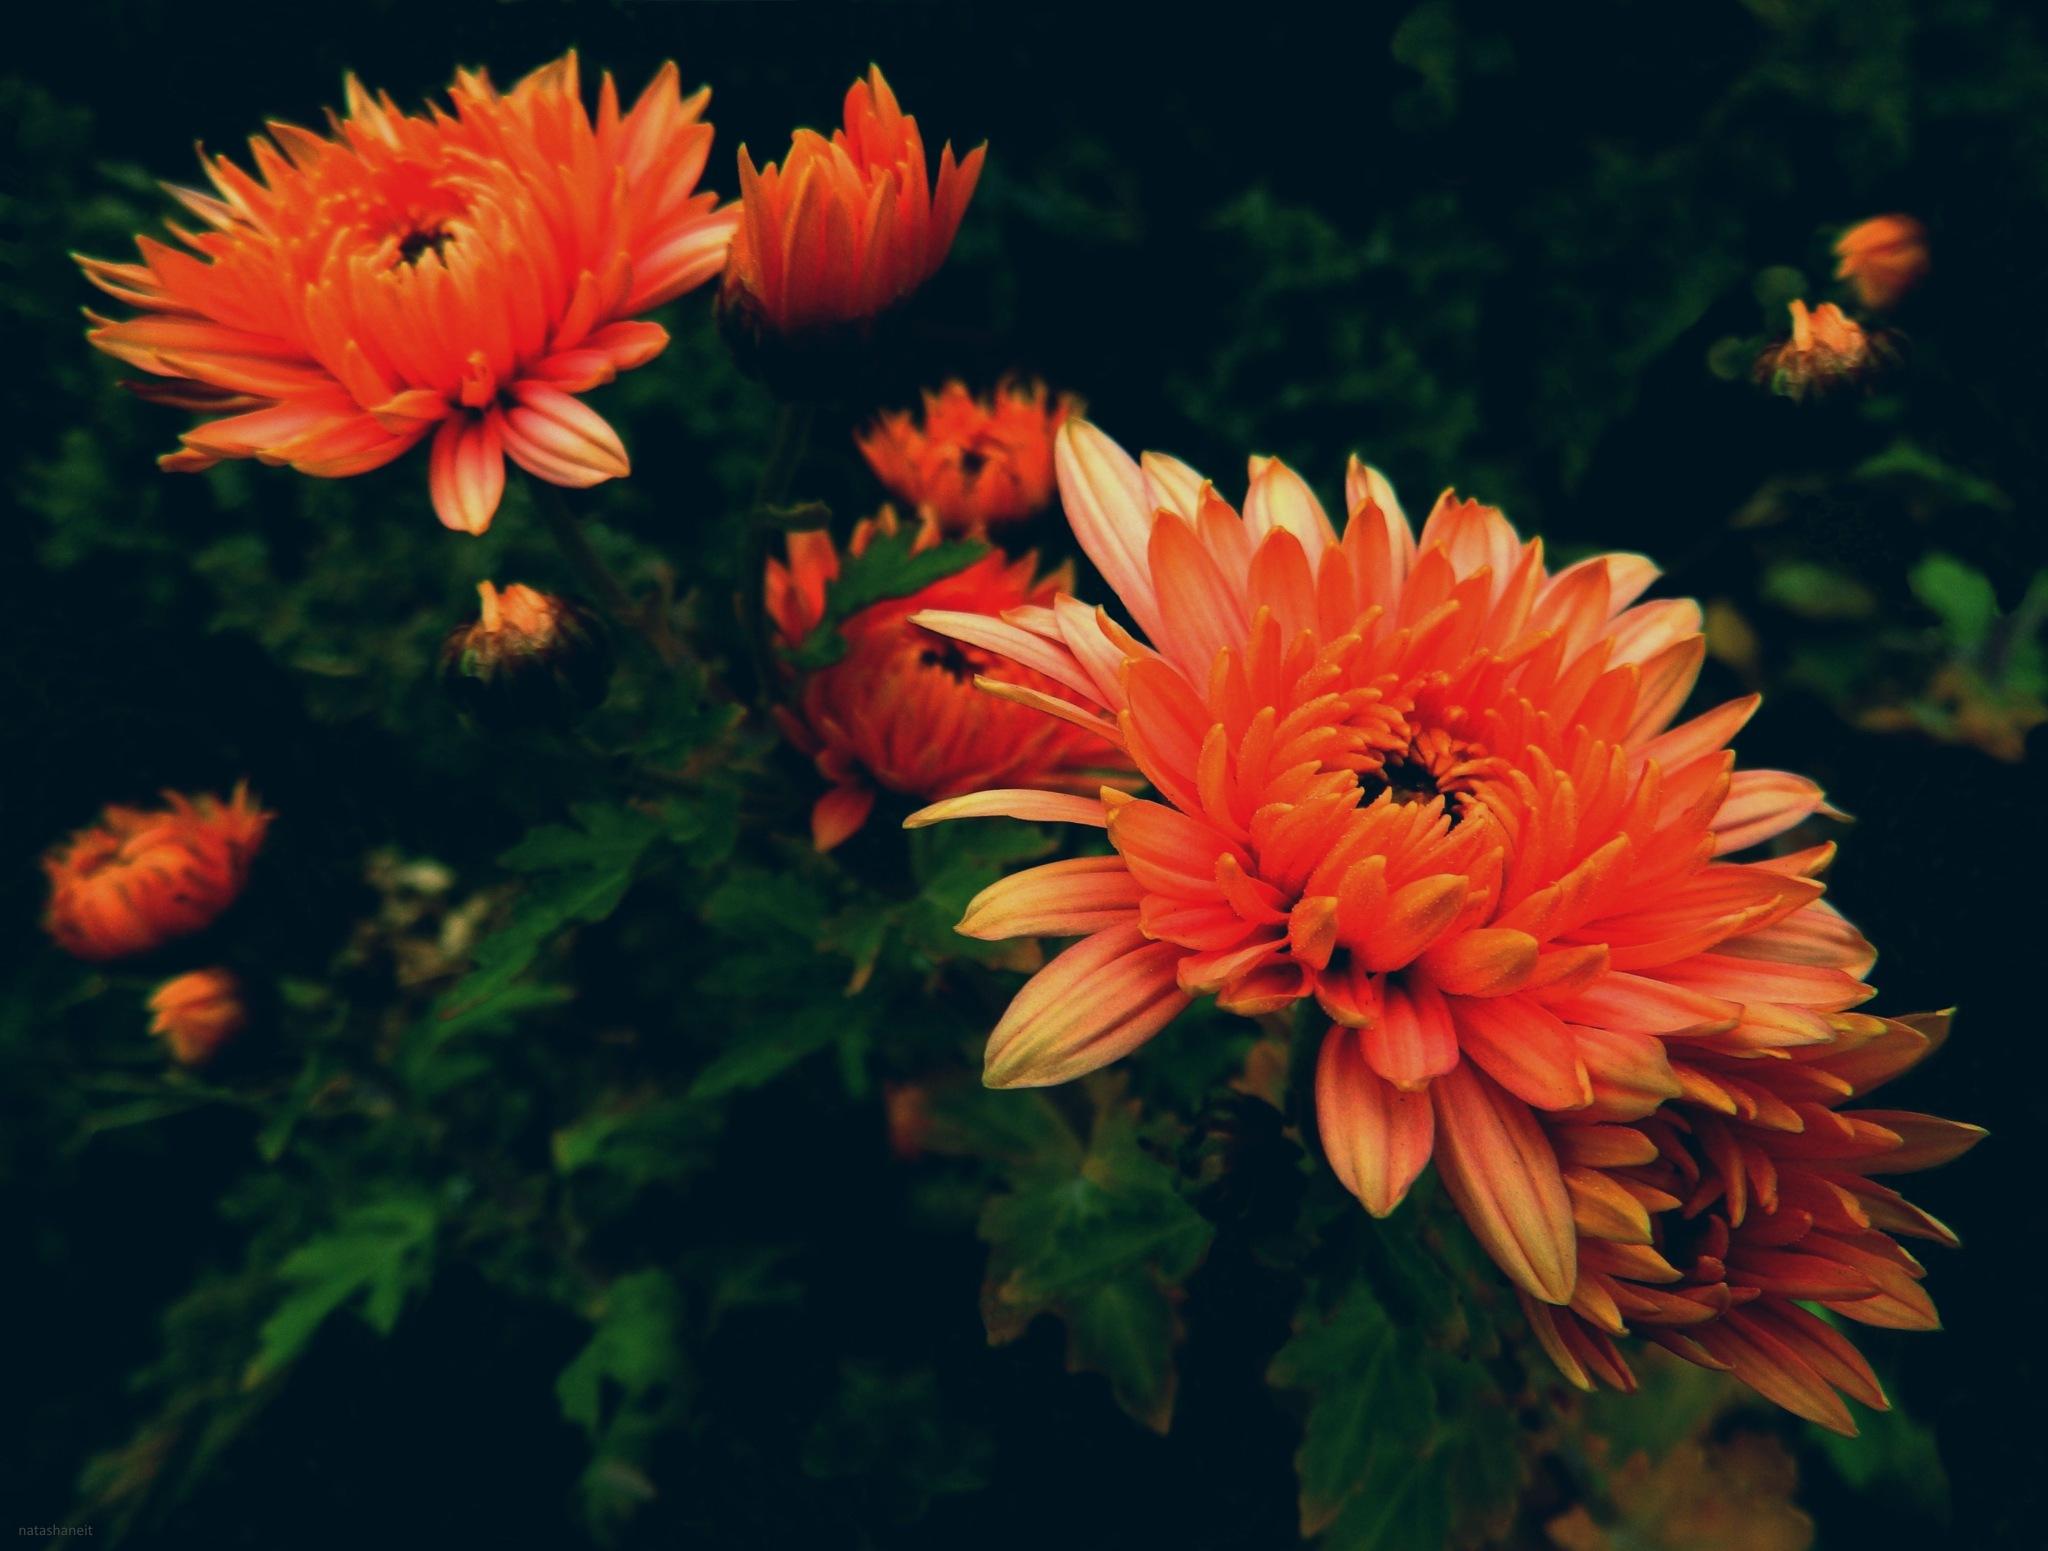 Orange chrysanthemum by natashaneit